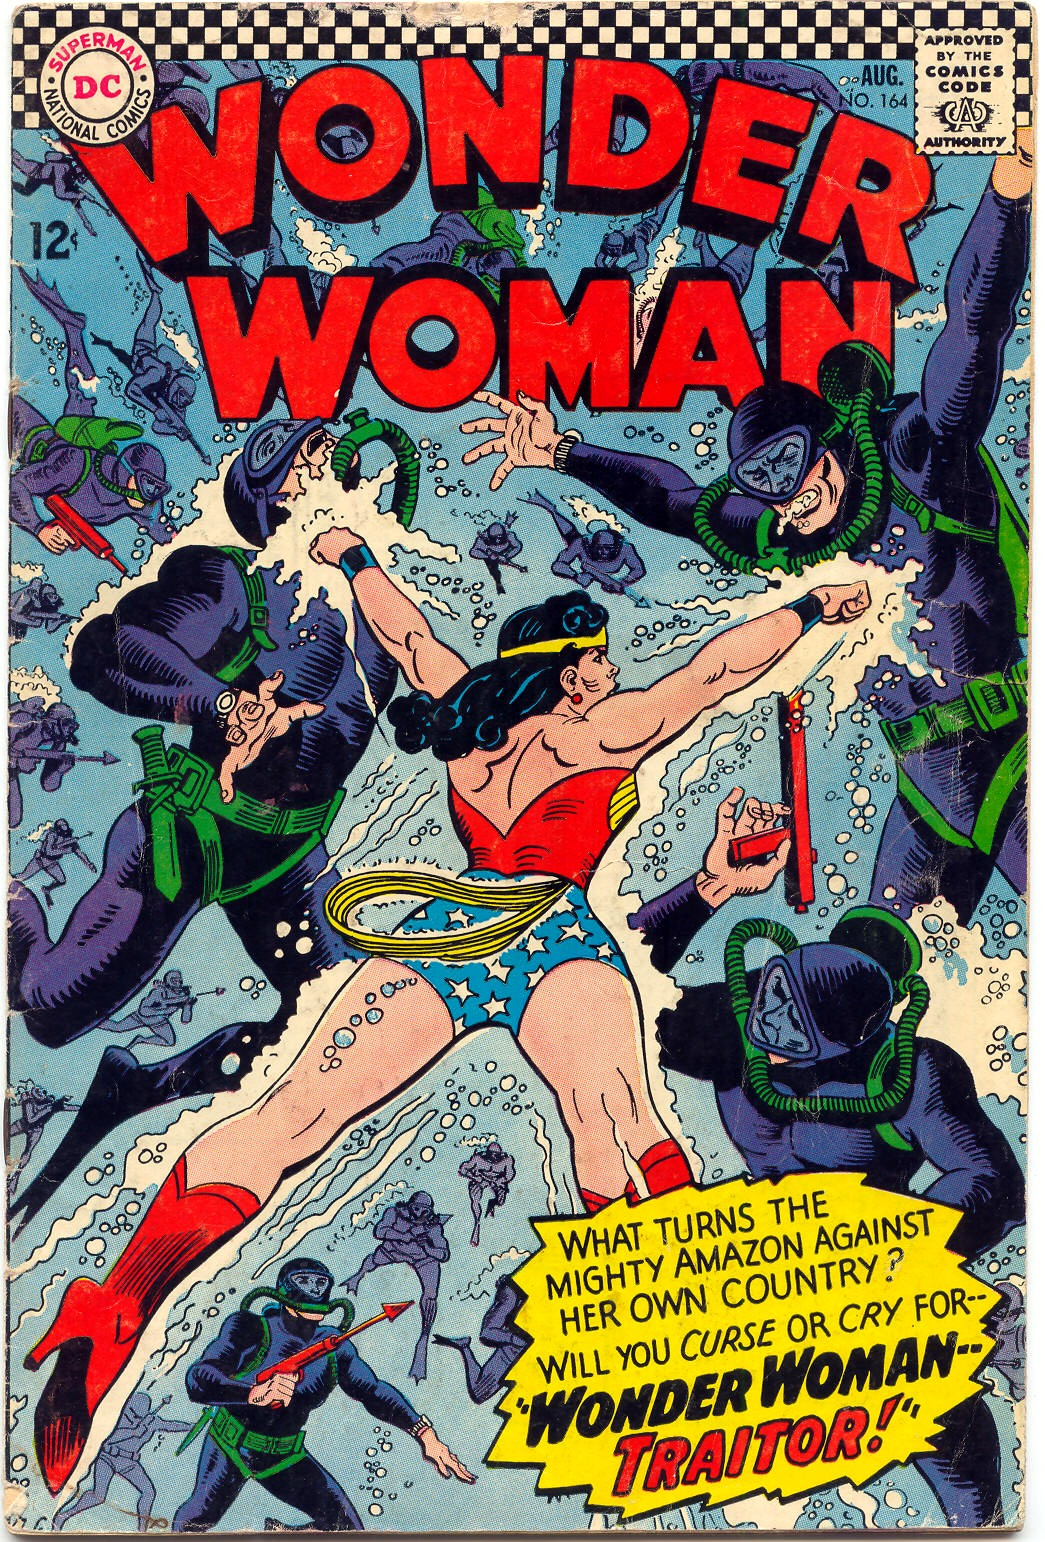 Read online Wonder Woman (1942) comic -  Issue #164 - 1